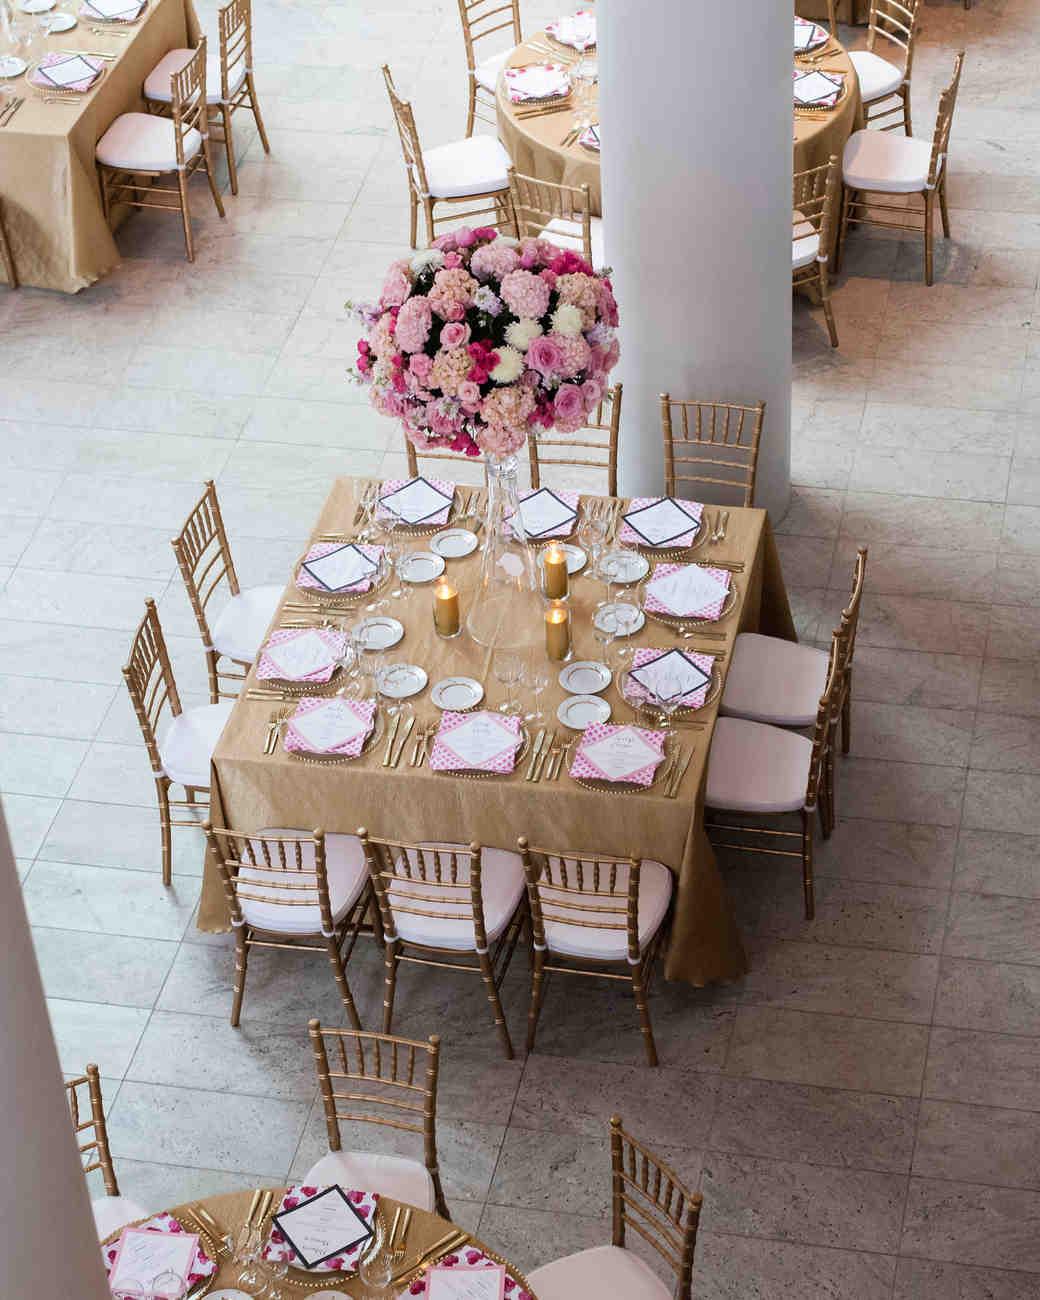 ashley-ryan-wedding-reception-3249-s111852-0415.jpg